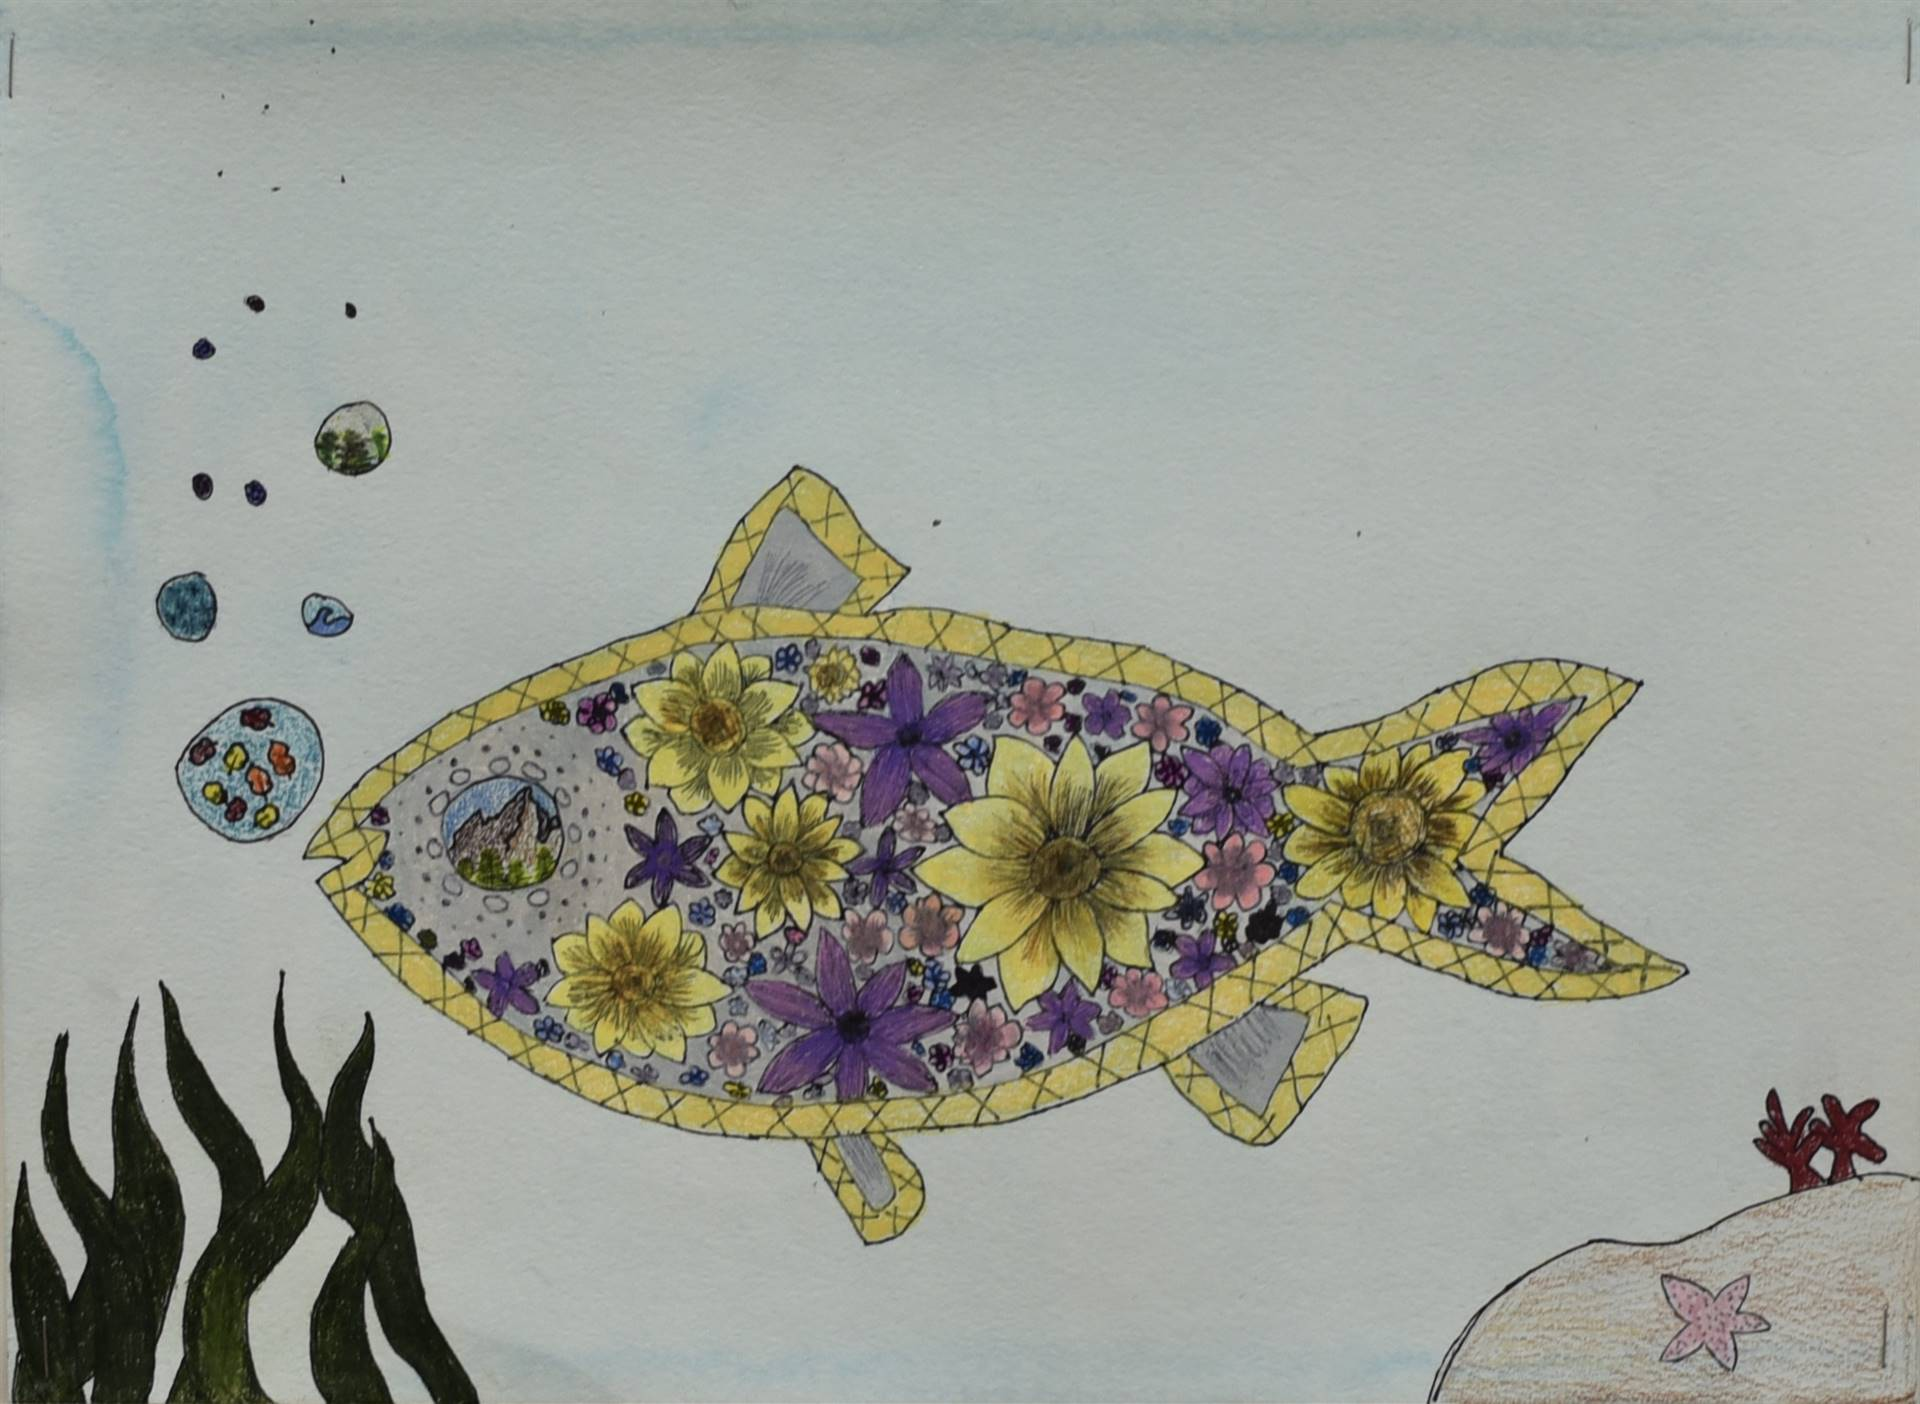 Brecksville-Broadview Hts. Middle School Art Projects 148